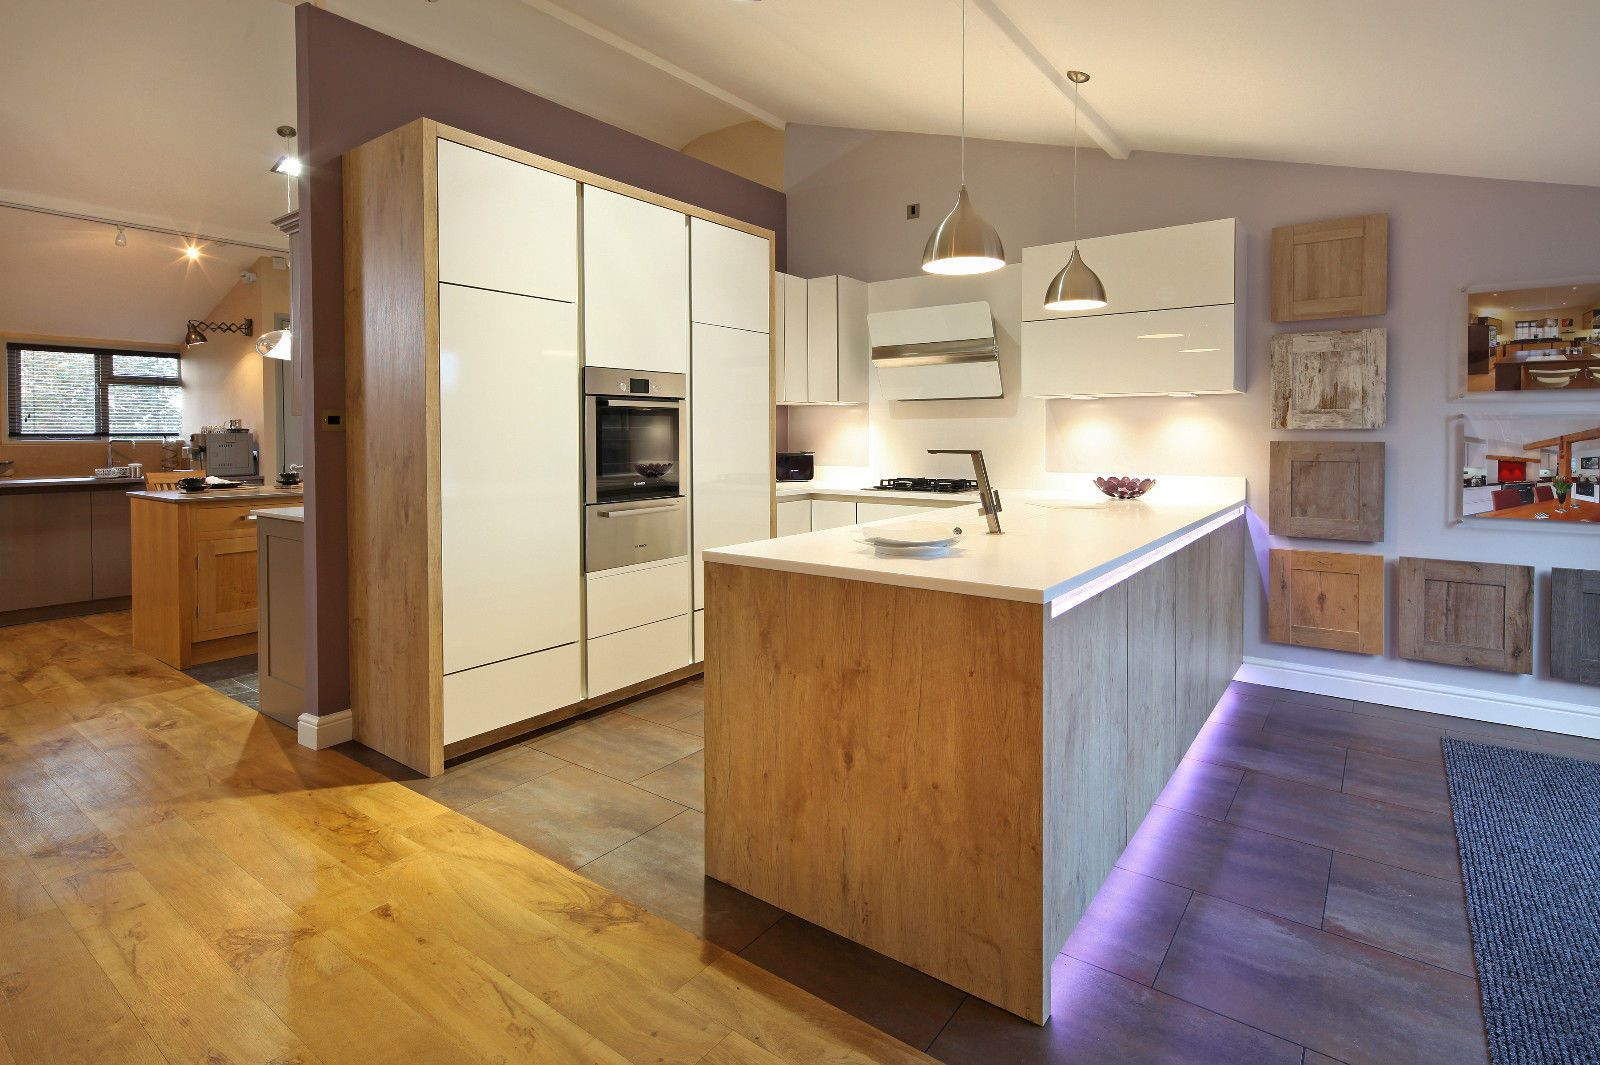 ex display kitchen rotpunkt kitchen display dia gloss door urban wild oak pinterest. Black Bedroom Furniture Sets. Home Design Ideas